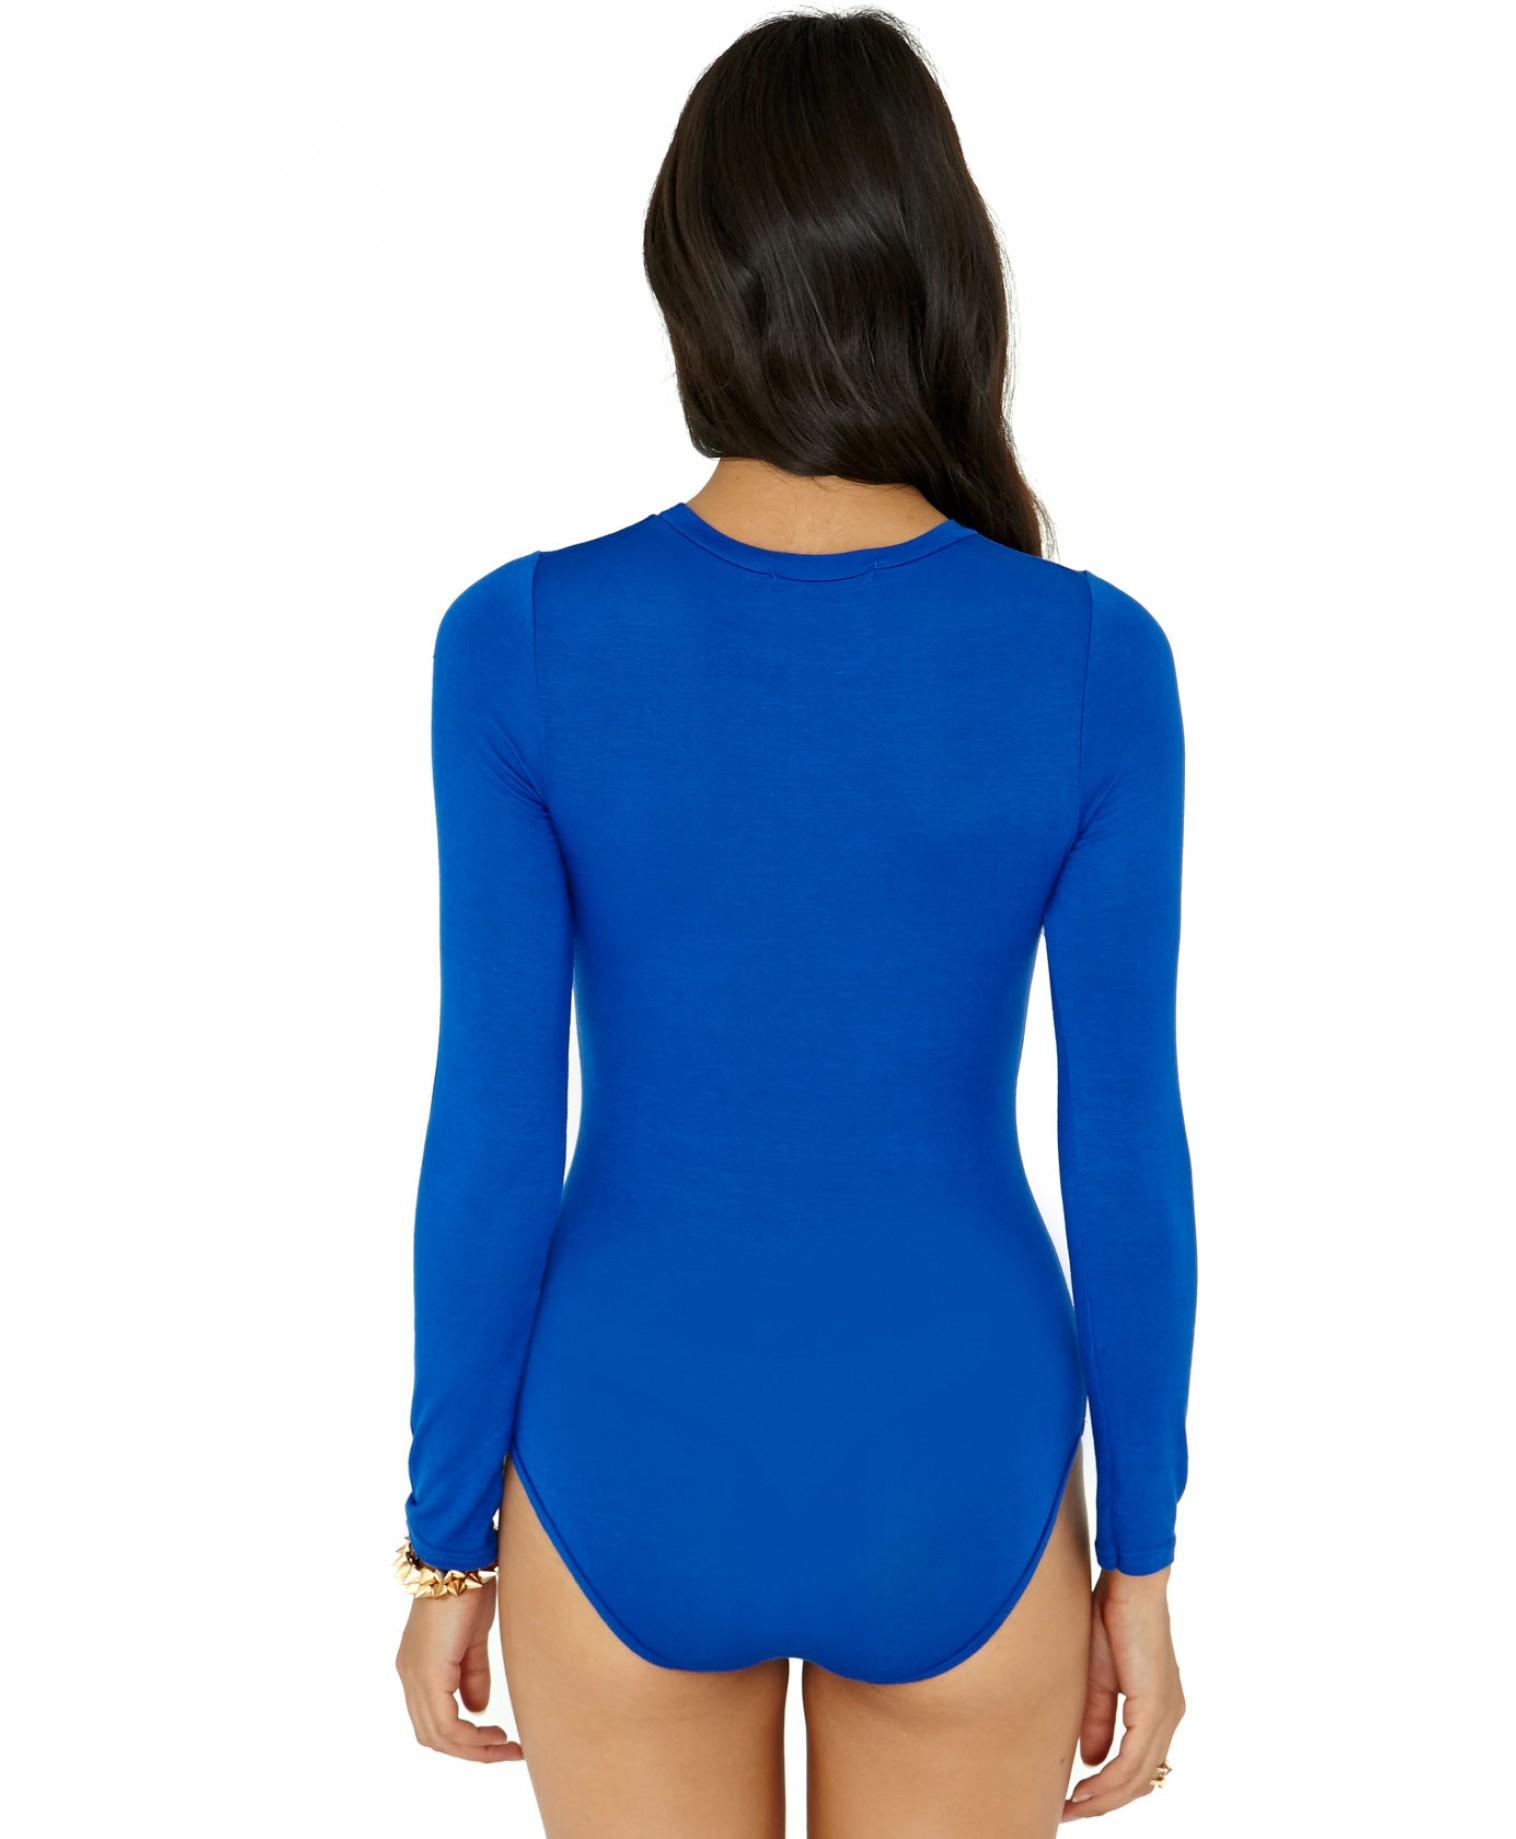 Lyst - Missguided Gerta Value Long Sleeve Bodysuit in Cobalt Blue in ... 27aef0dac